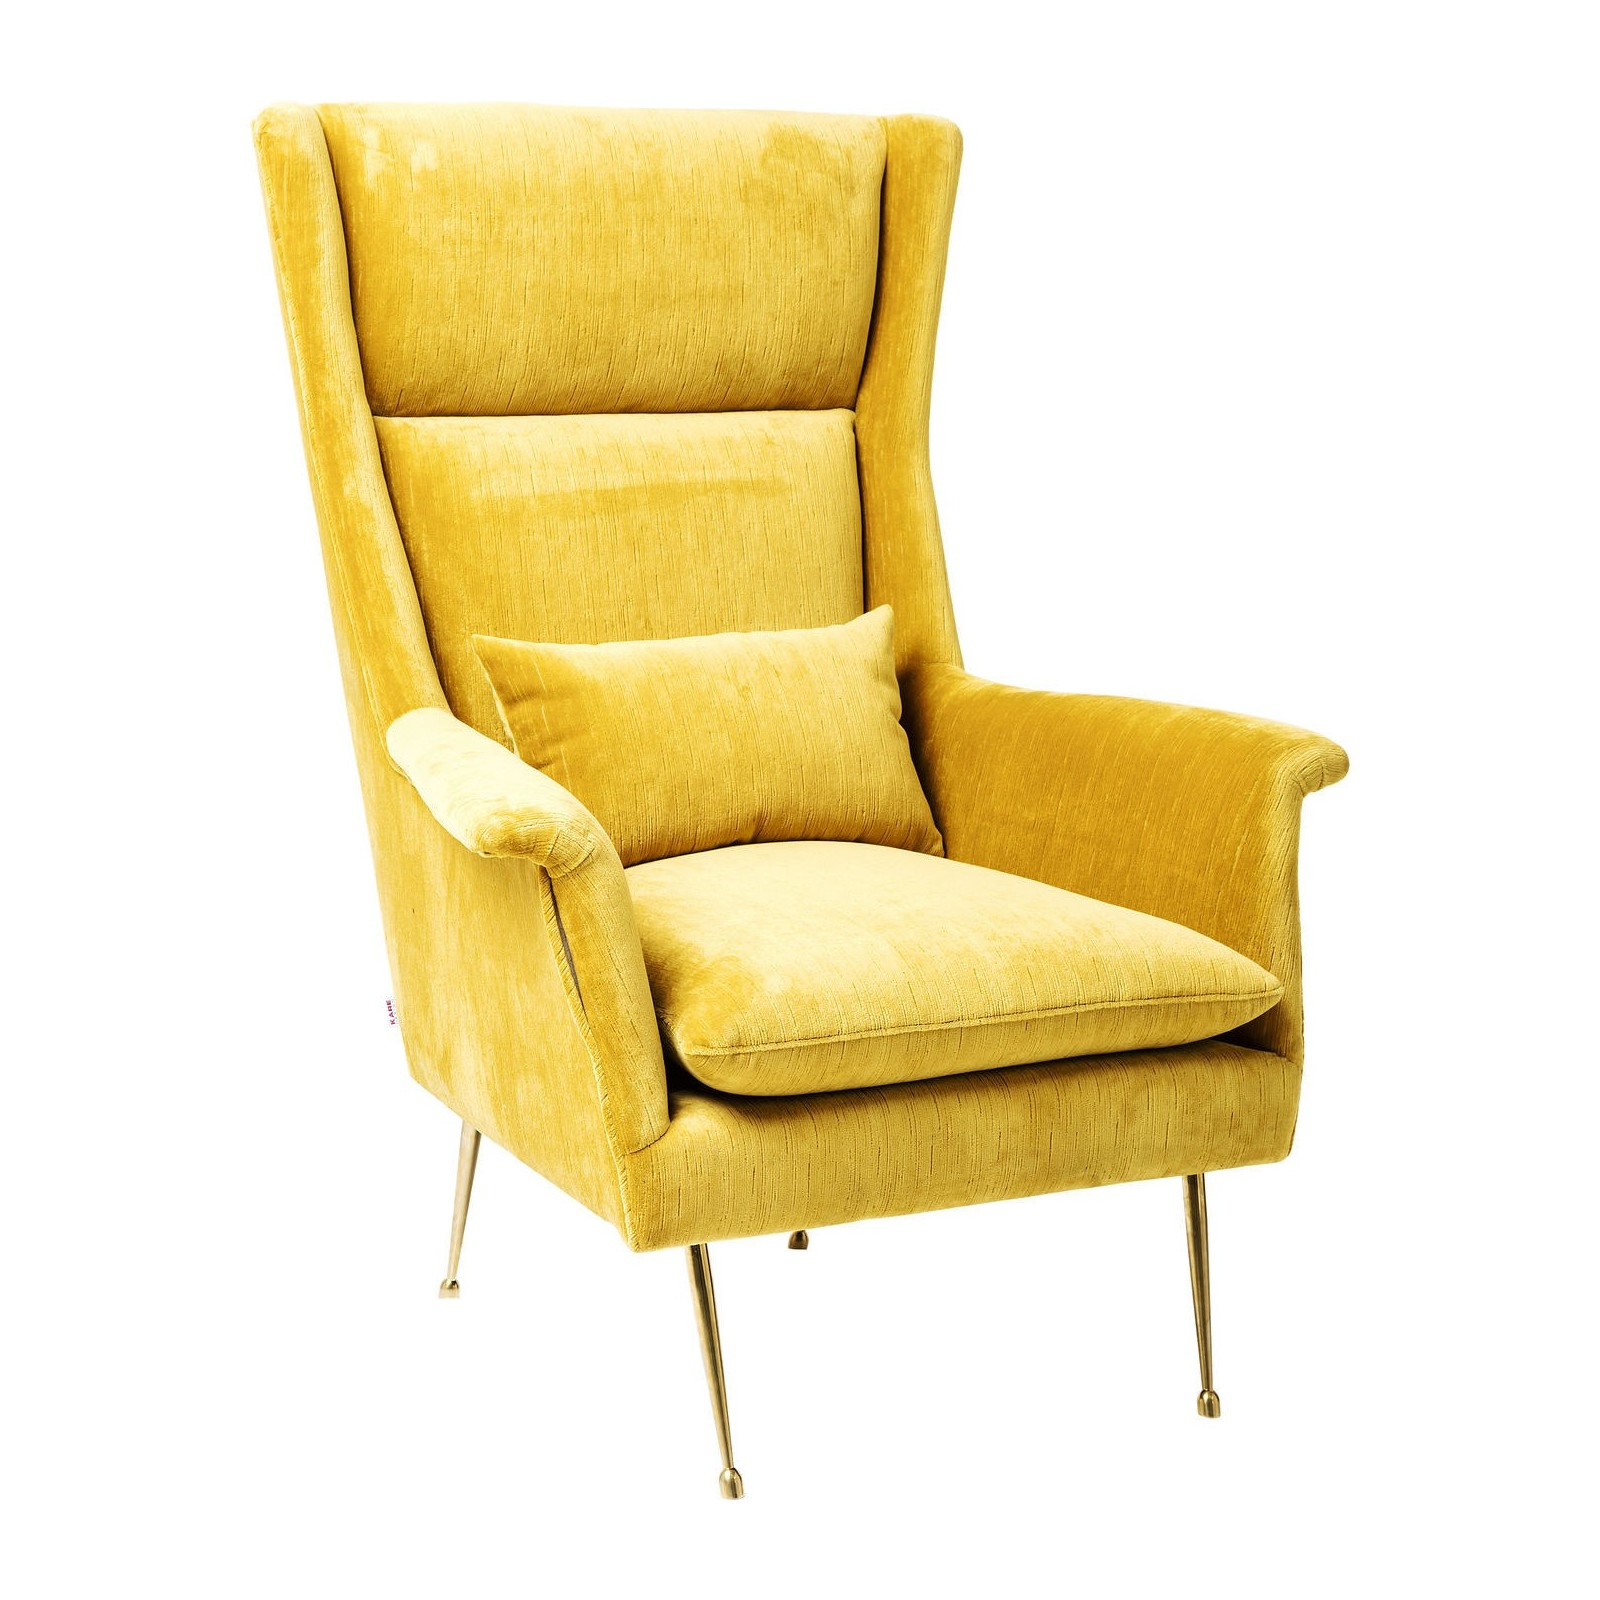 comment bien choisir son canap kare click. Black Bedroom Furniture Sets. Home Design Ideas